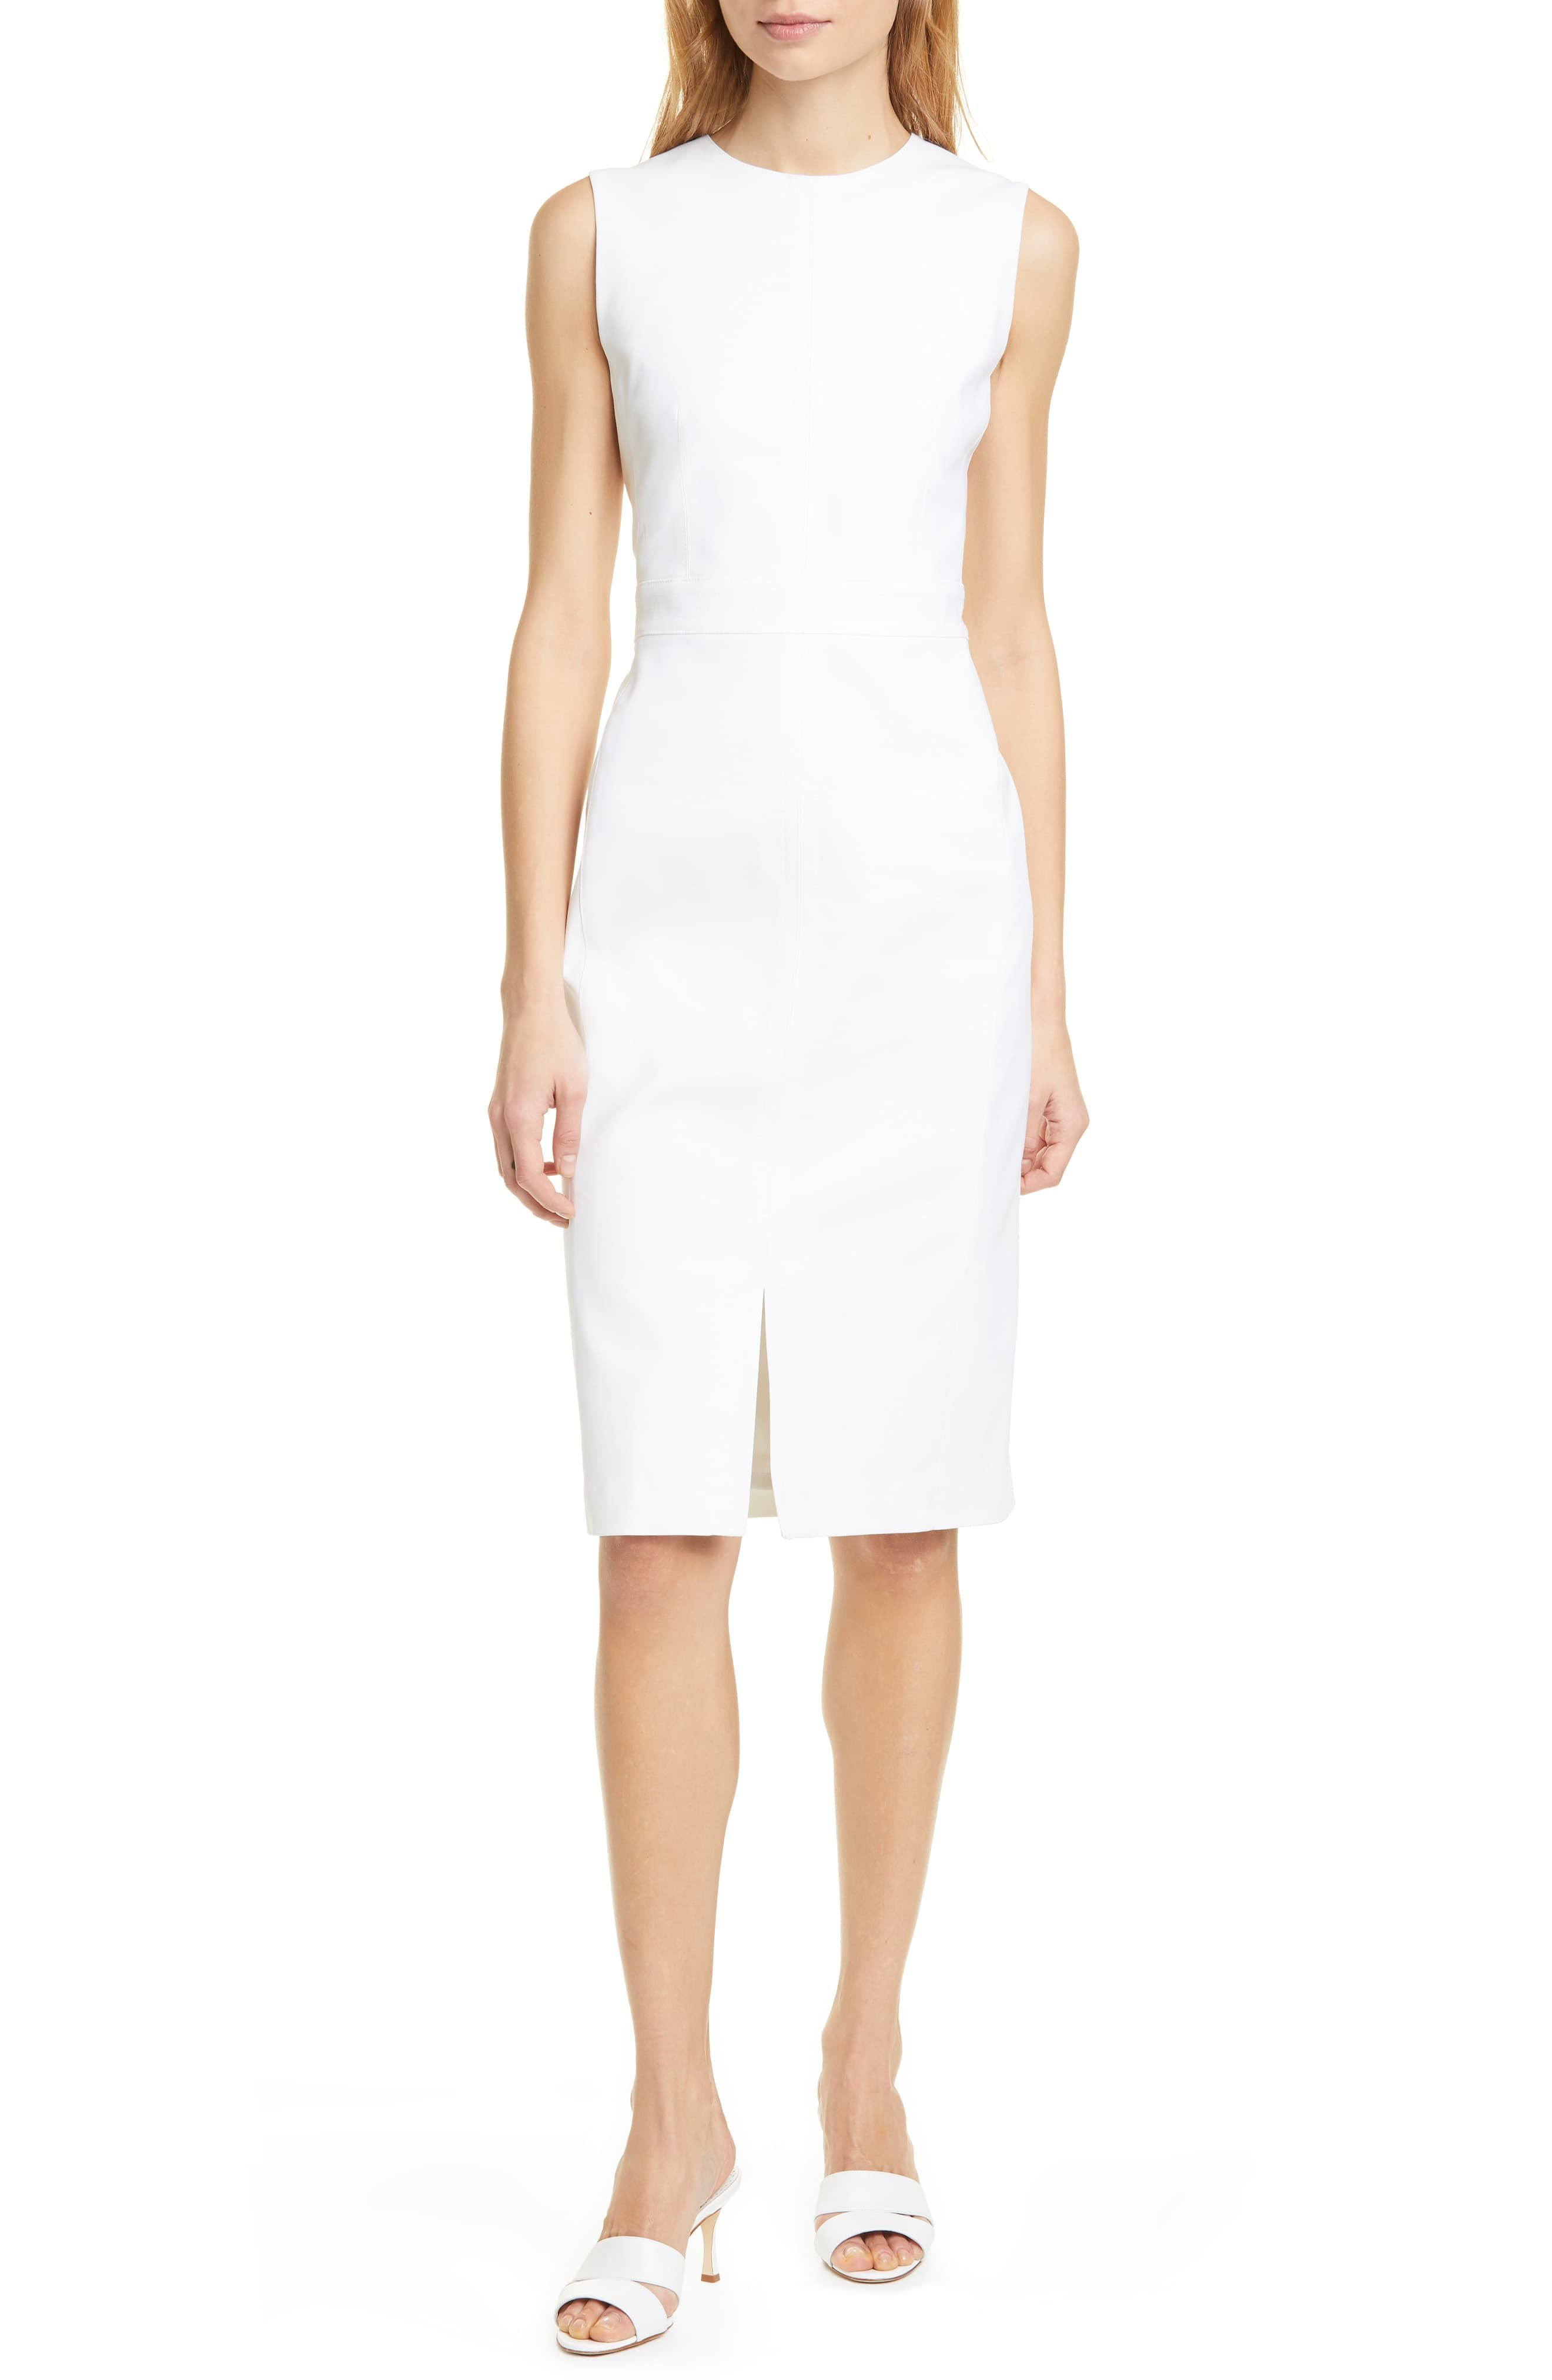 Women S Judith Charles Breuer Sleeveless Sheath Dress Size 6 Ivory In 2020 Sleeveless Sheath Dress Fashion Clothes Women Sheath Dress